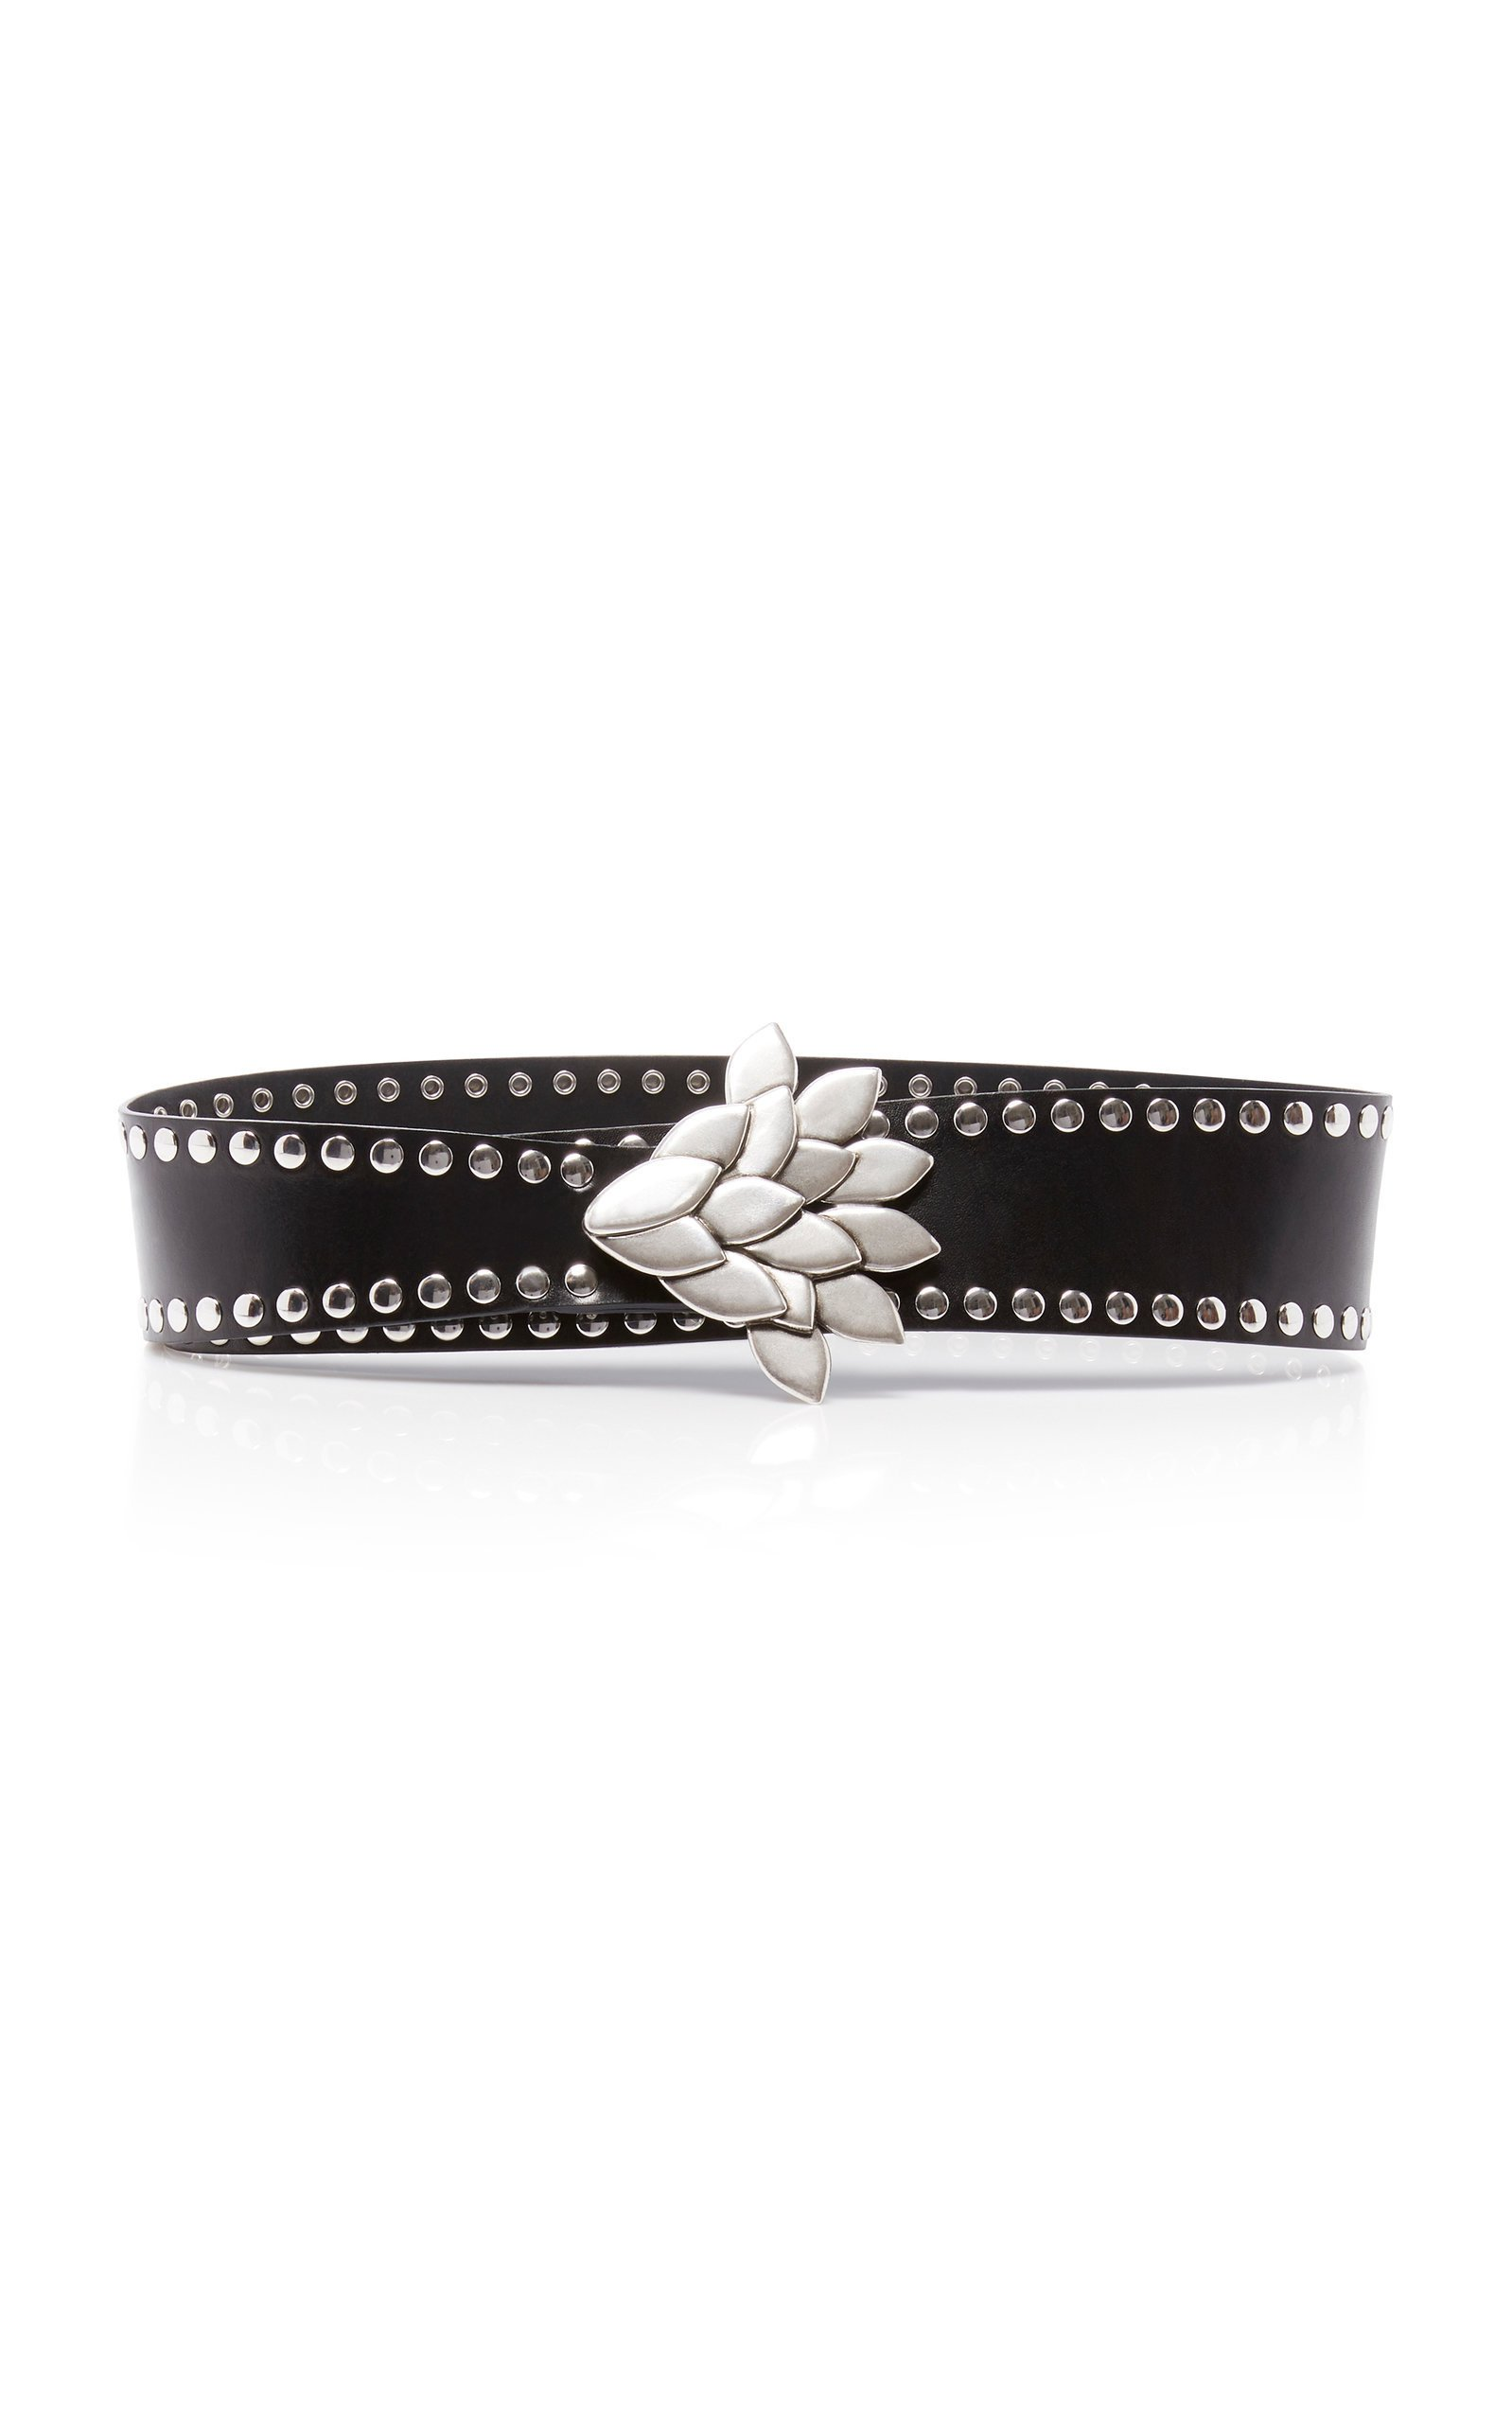 Isabel Marant Lowi Studded Leather Belt Size: XL